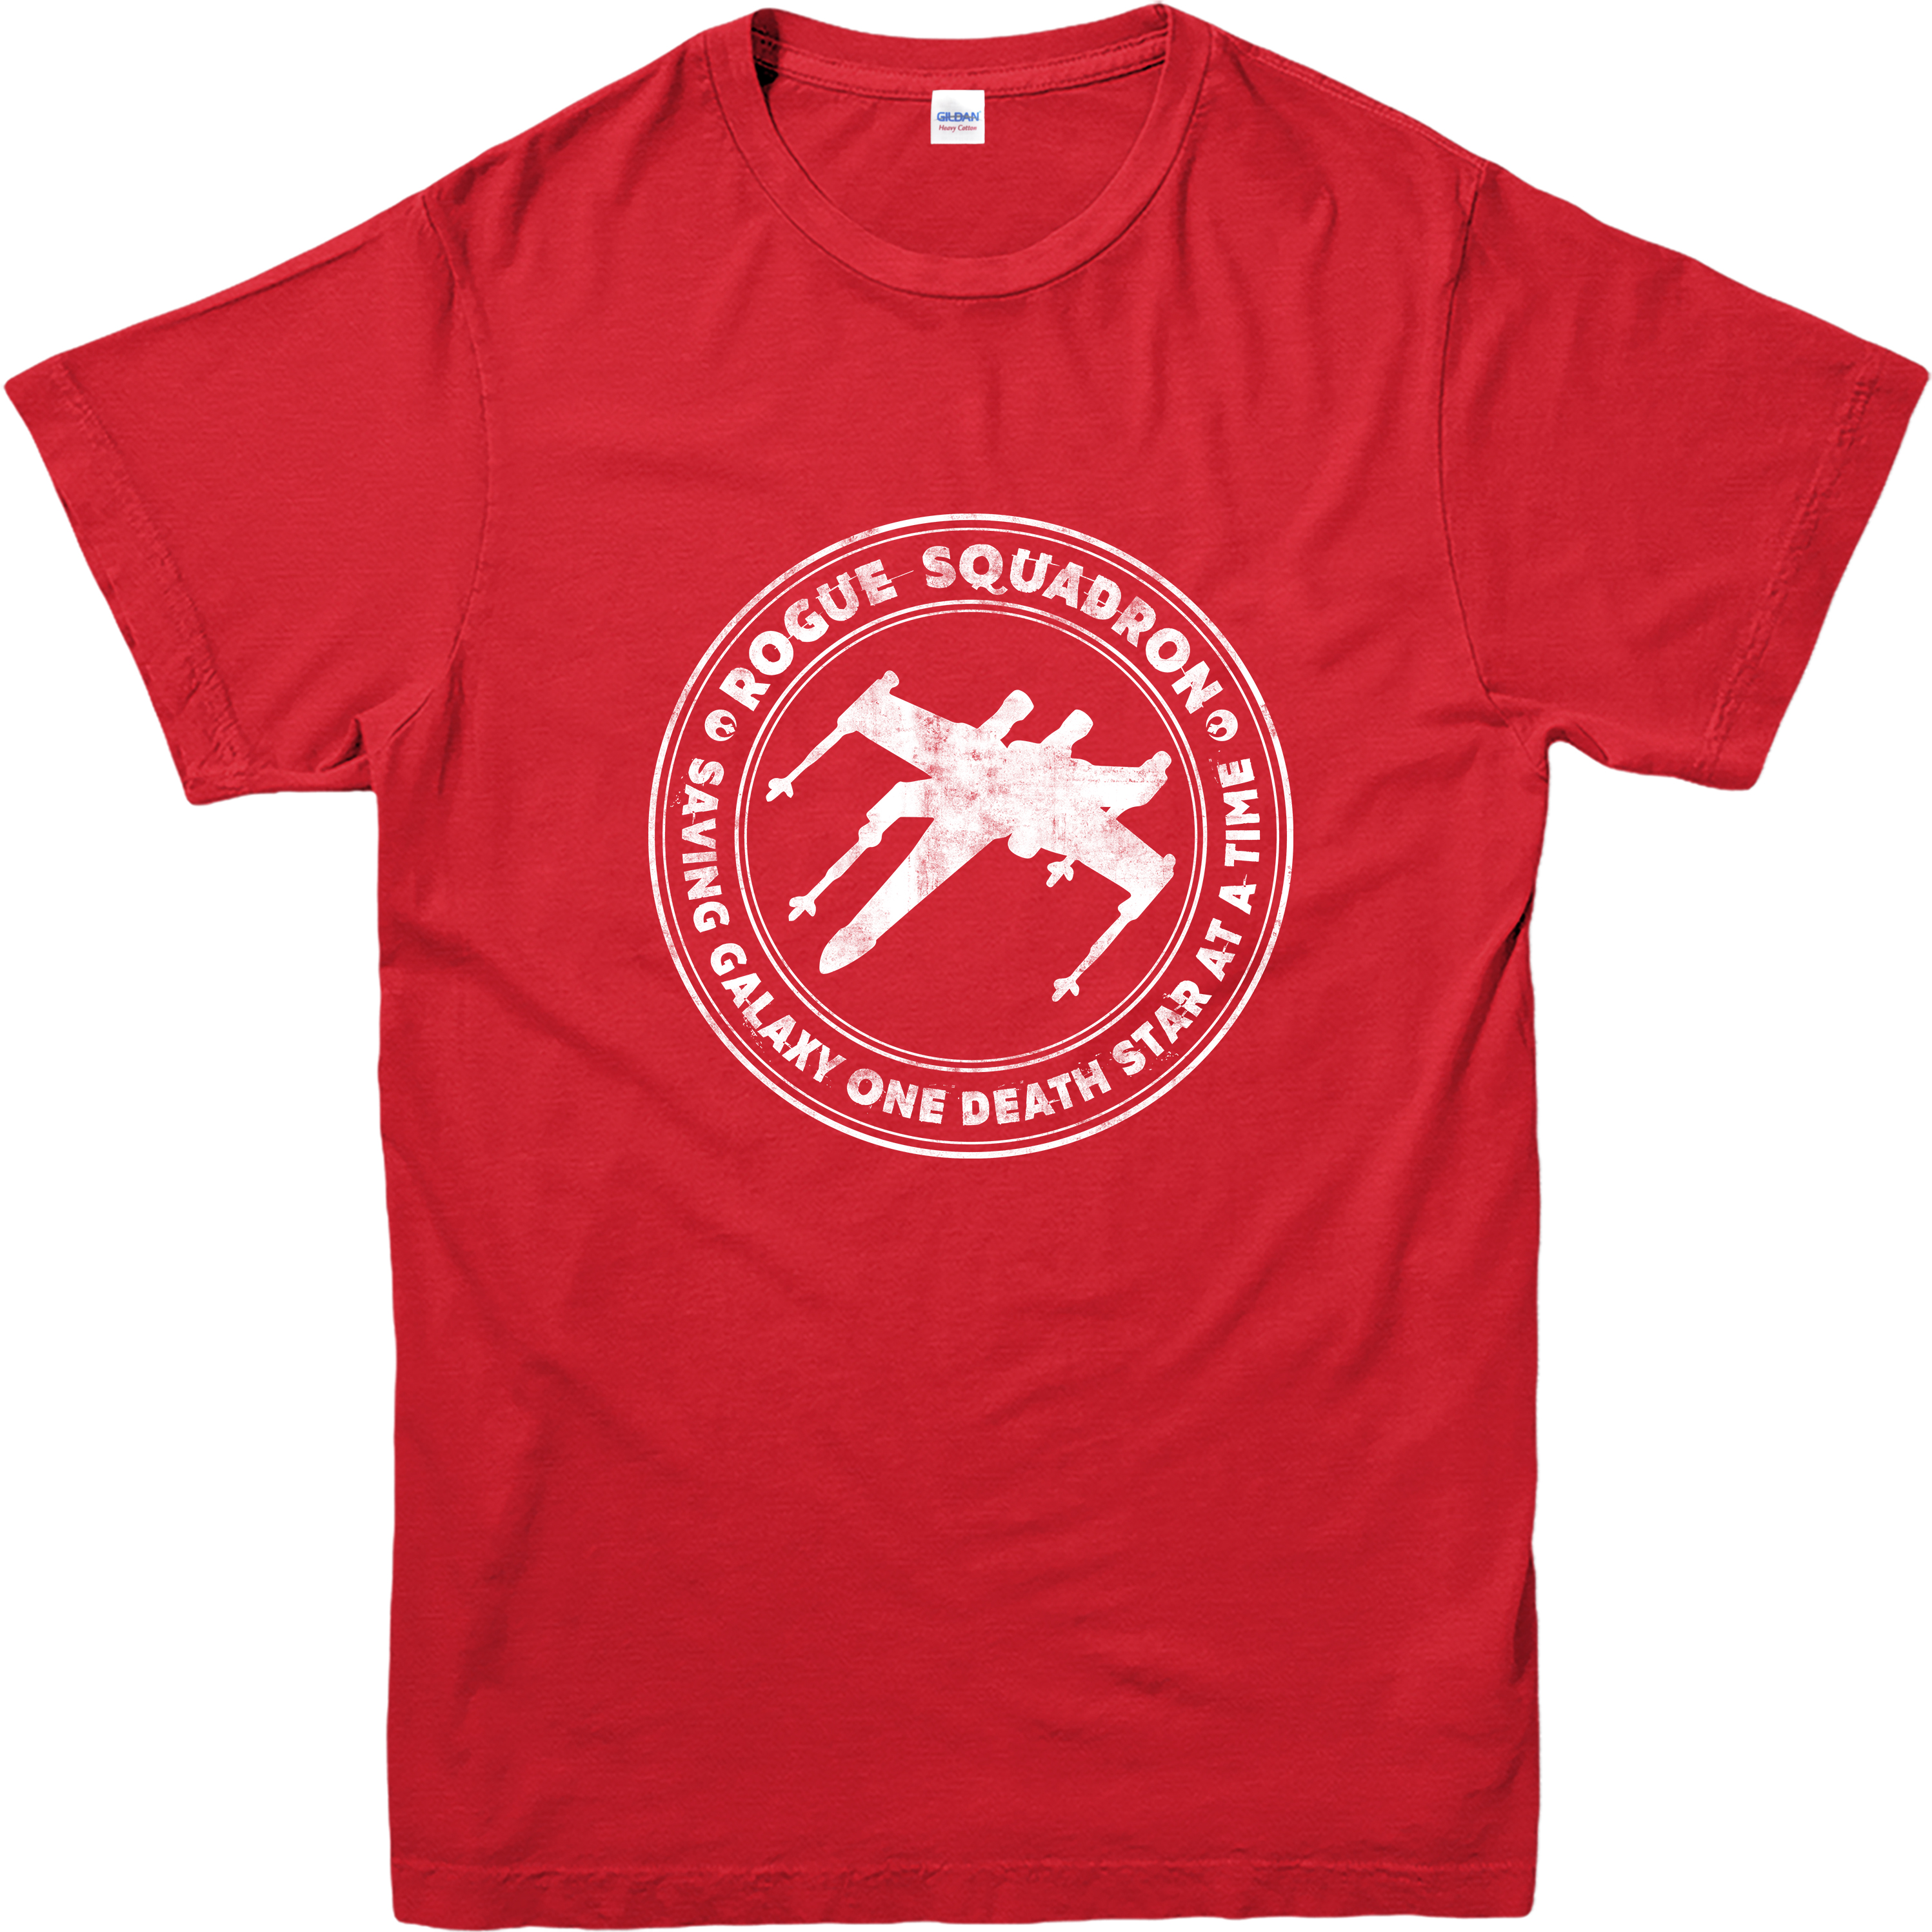 Design t shirt galaxy - Star Wars T Shirt Rogue Squadron Saving Galaxy